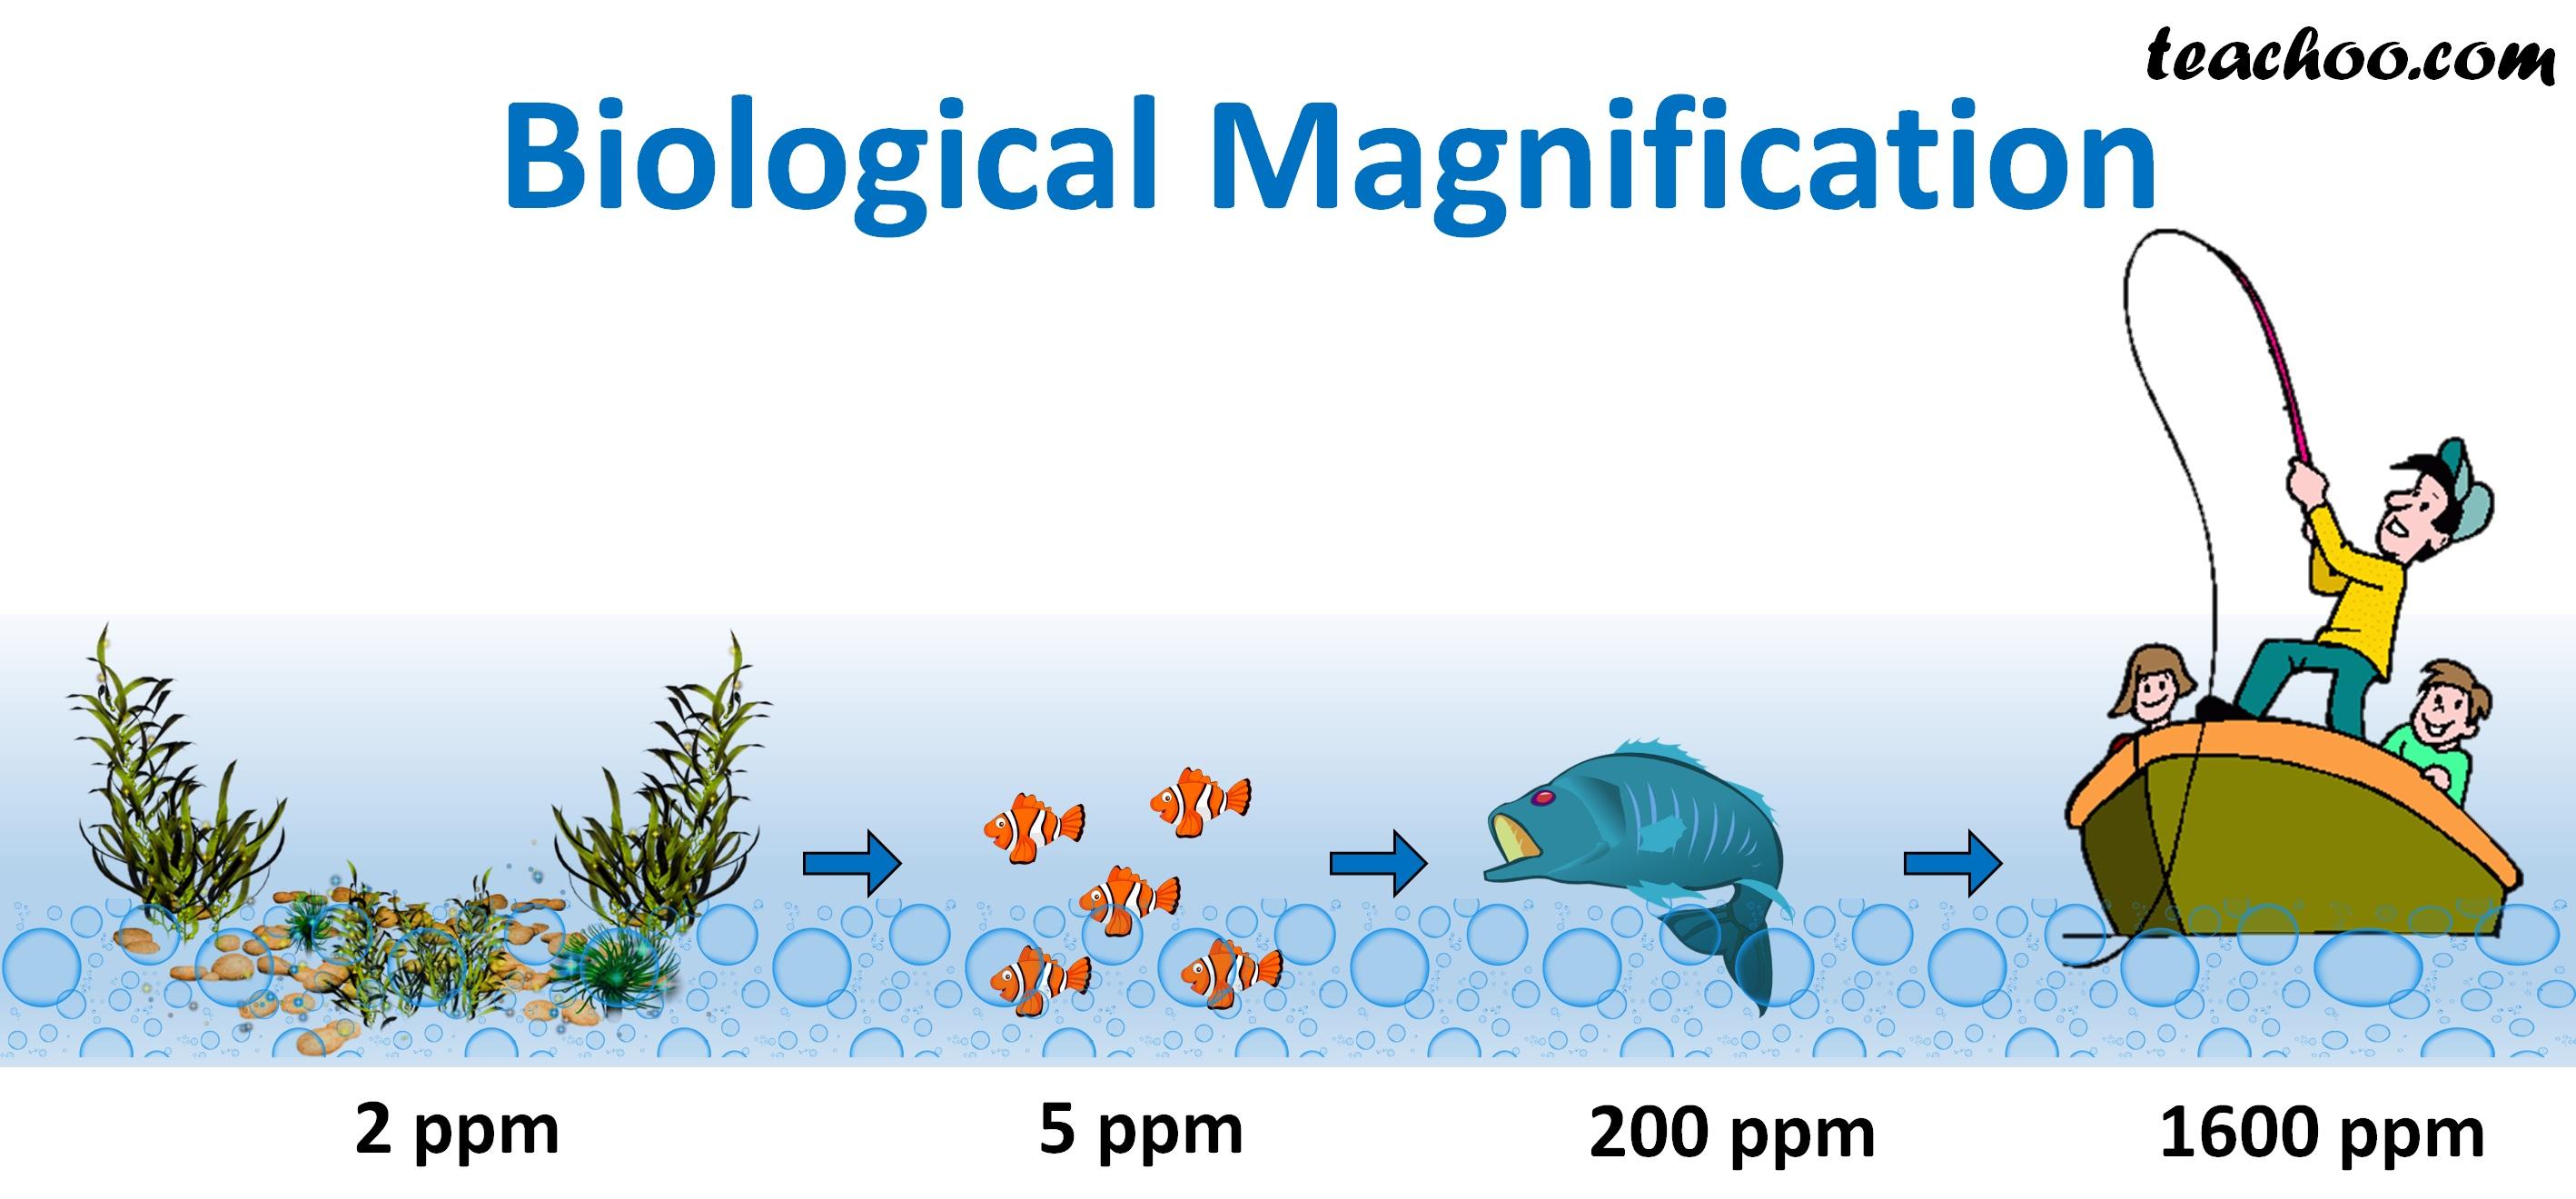 Biological Magnification - Teachoo.jpg